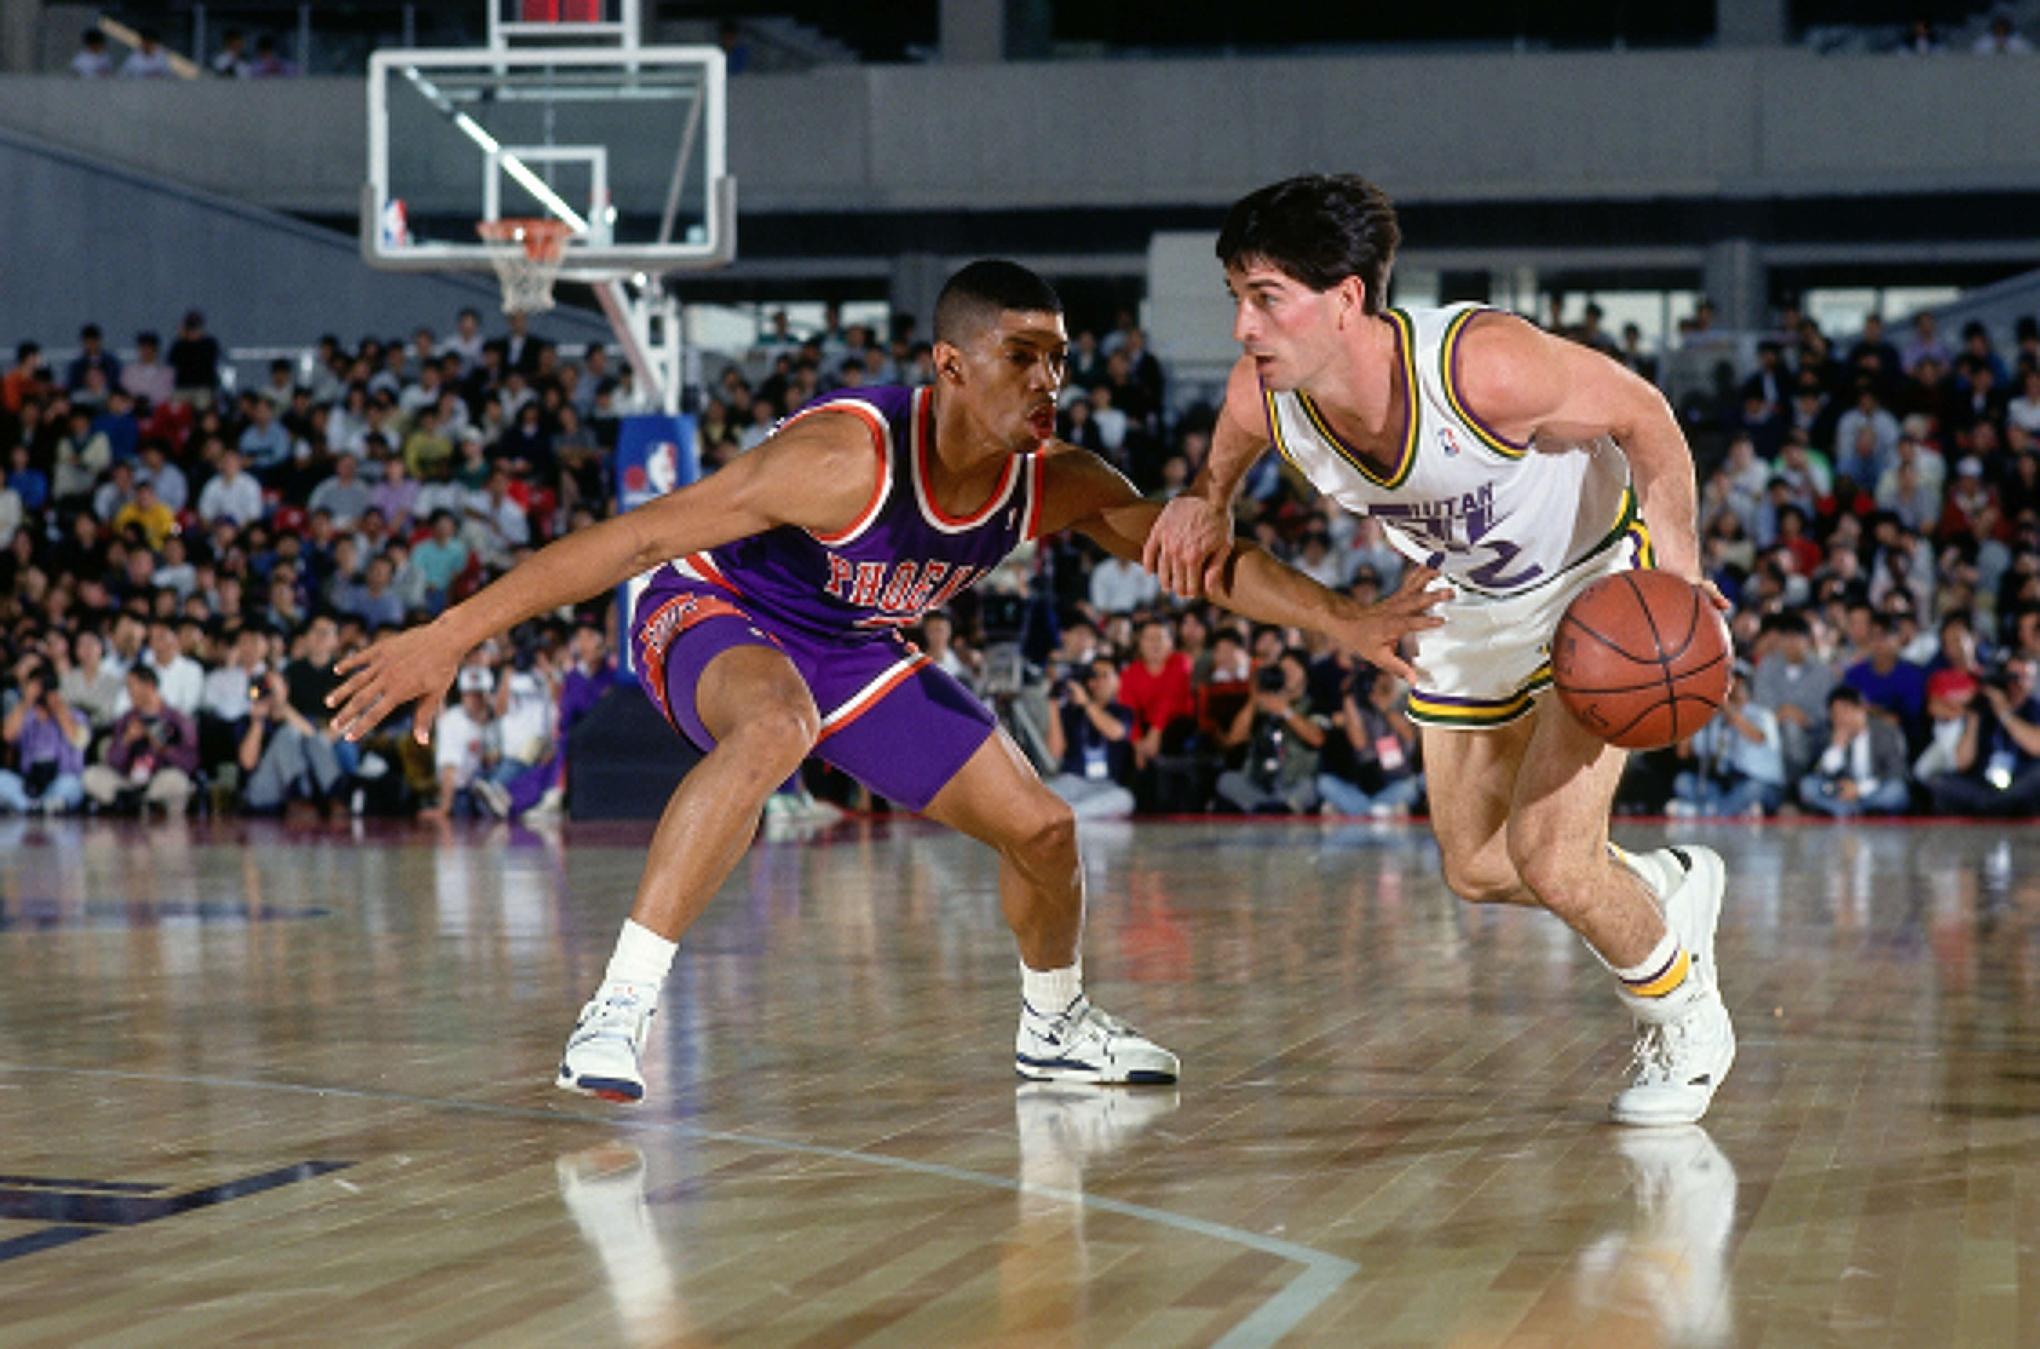 193181279f4 Would Michael Jordan have starred in today s NBA  - SBNation.com